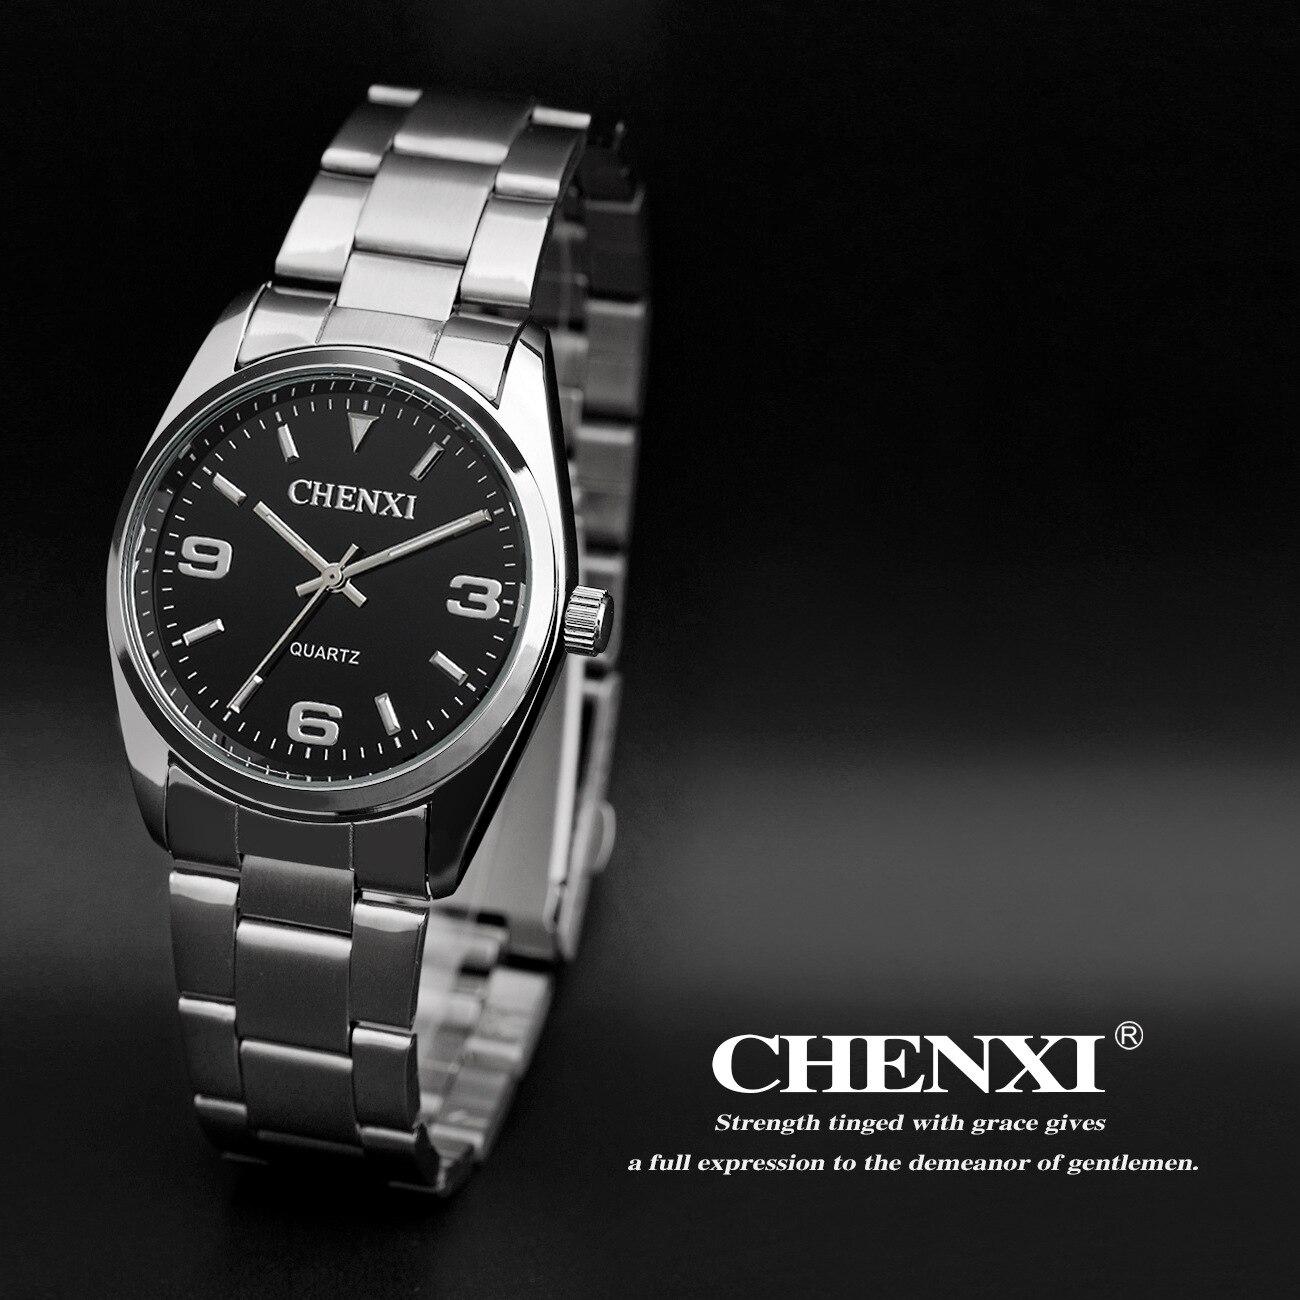 CHENXI Brand Hardlex Shockproof Japan Core Waterproof Dress Quartz Wristwatches Wrist Watch for Men Women 003A<br><br>Aliexpress